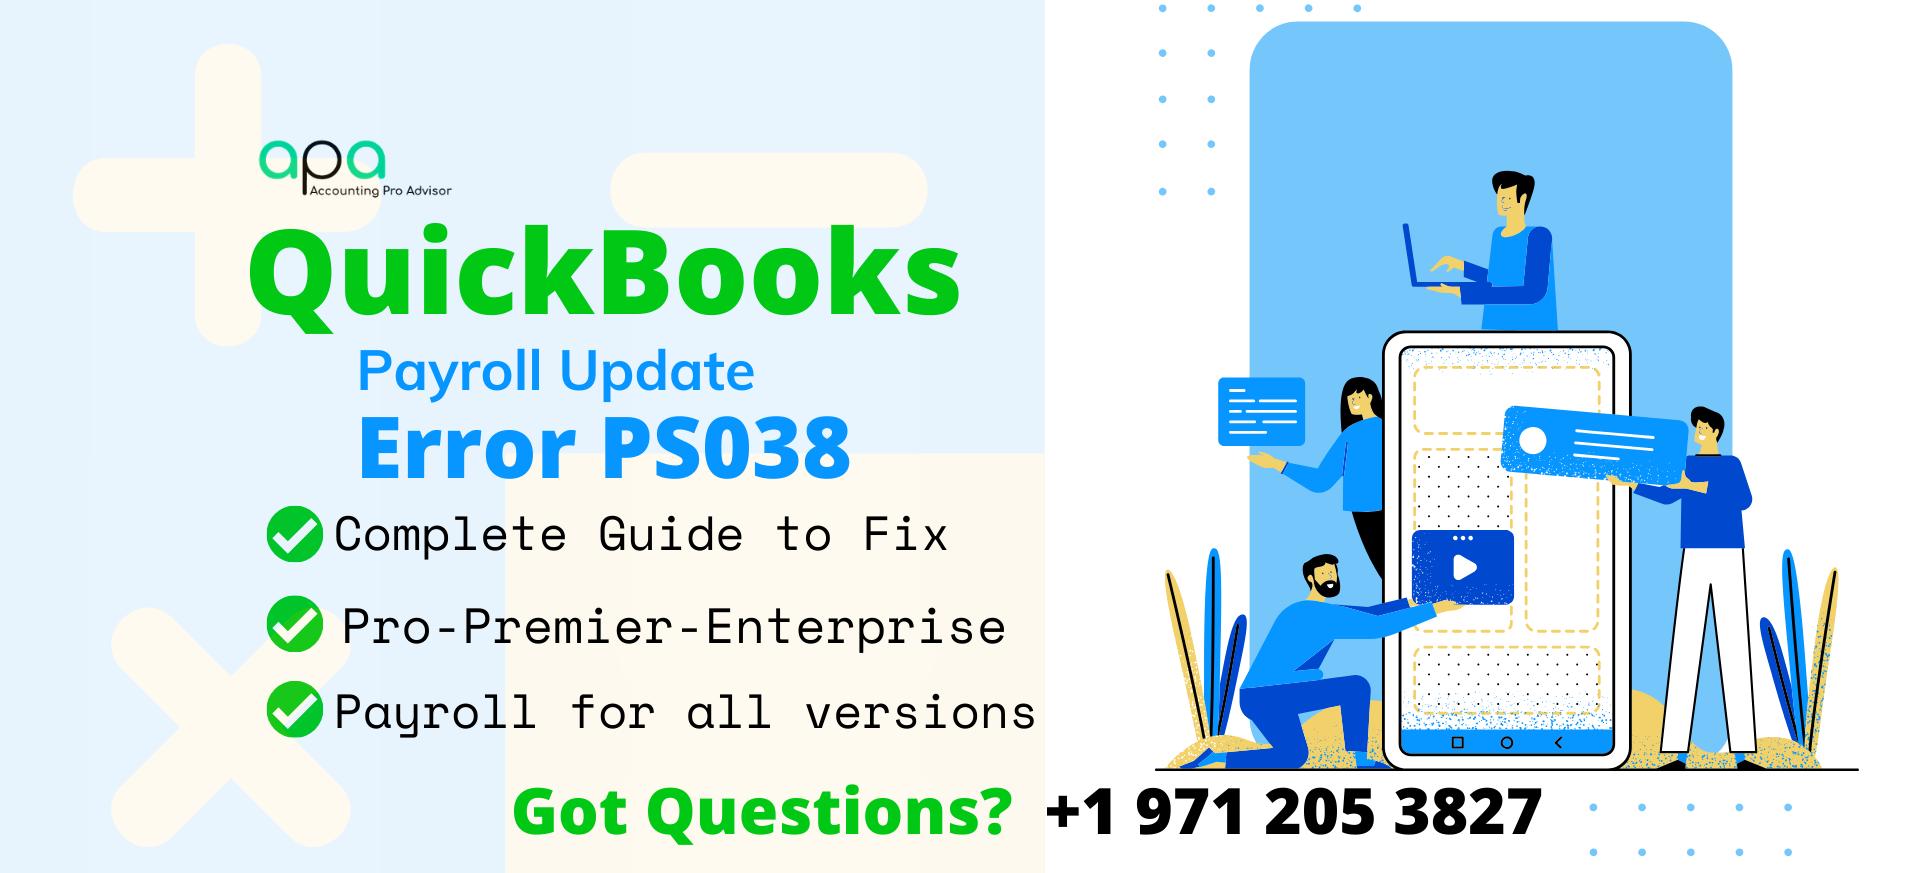 QuickBooks Payroll update error PS038 (2)